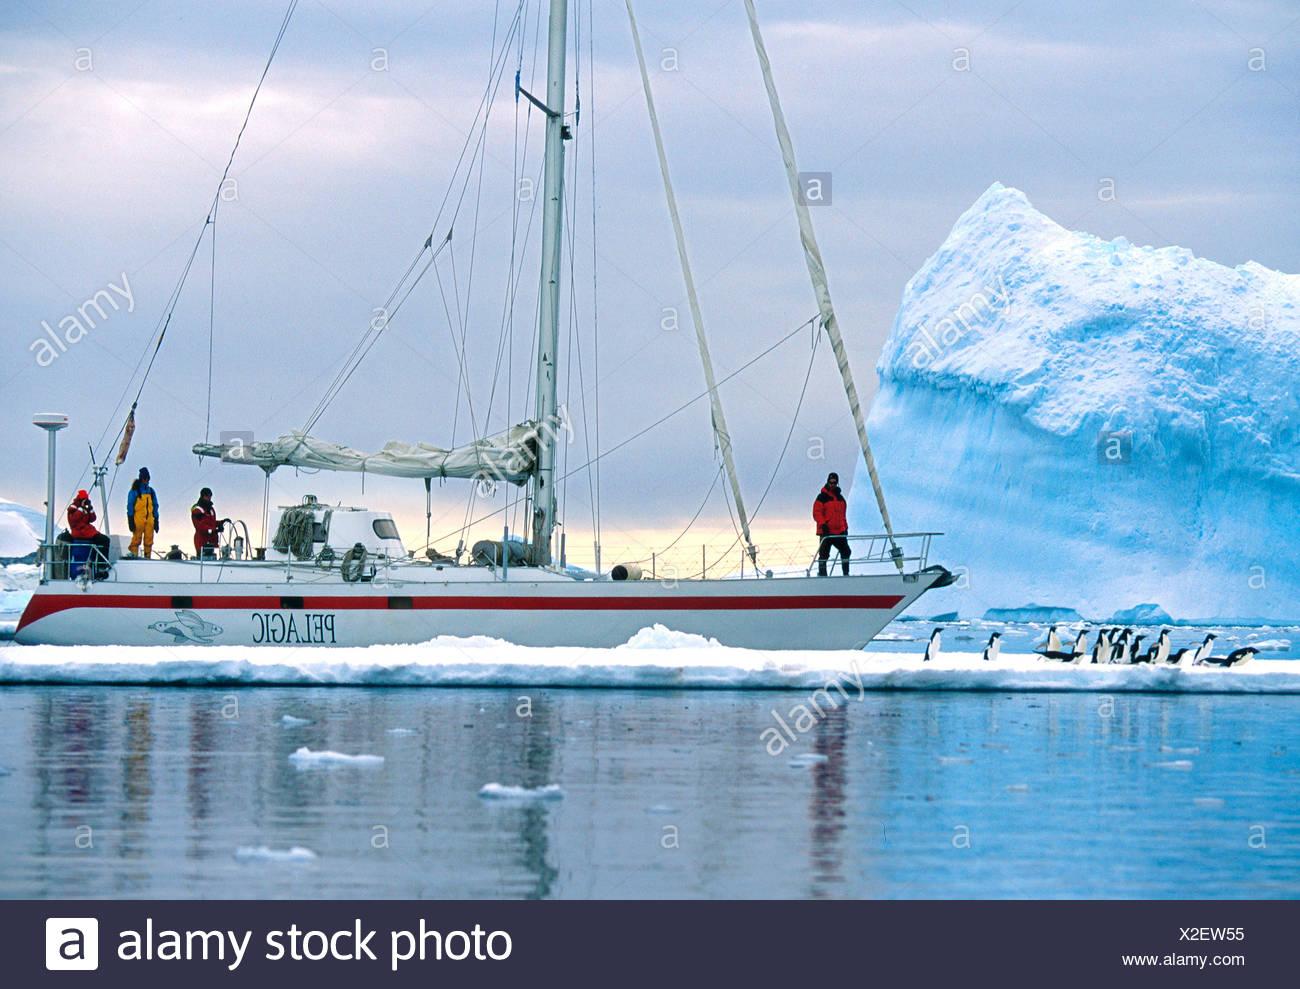 The Yacht Pelagic sails past penguins in Antartica - Stock Image